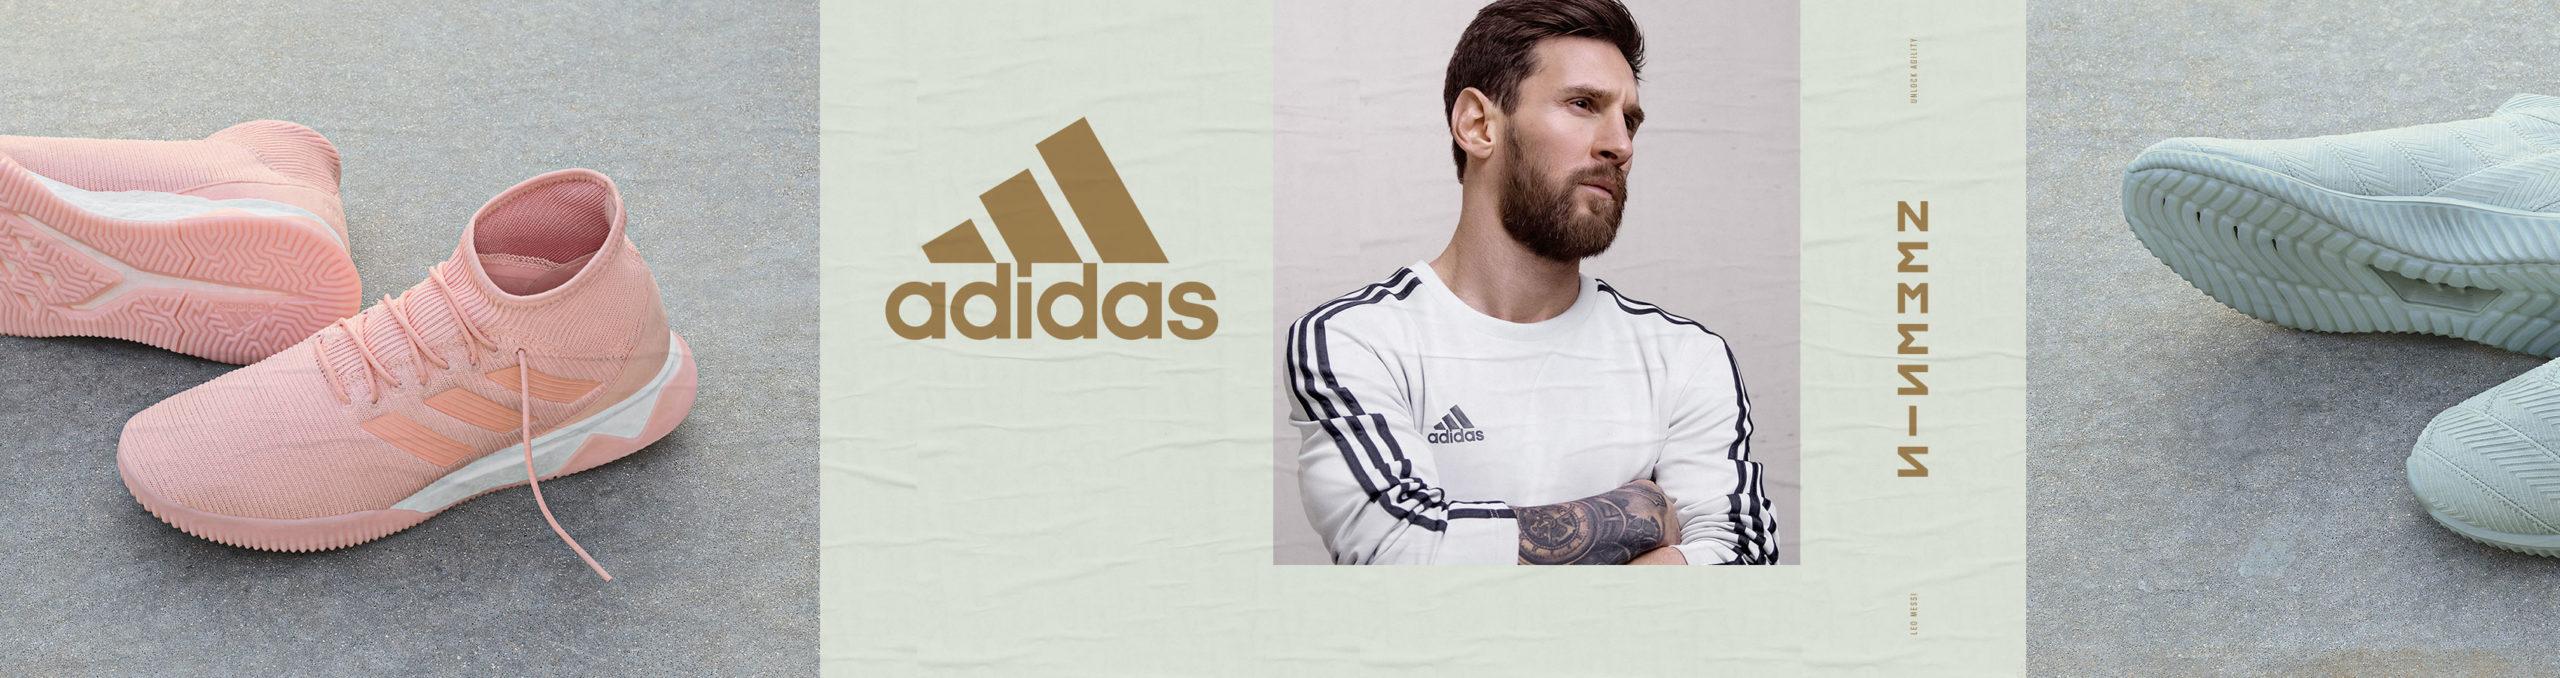 RobsonUnited2020_adidasFW18_Spectral02